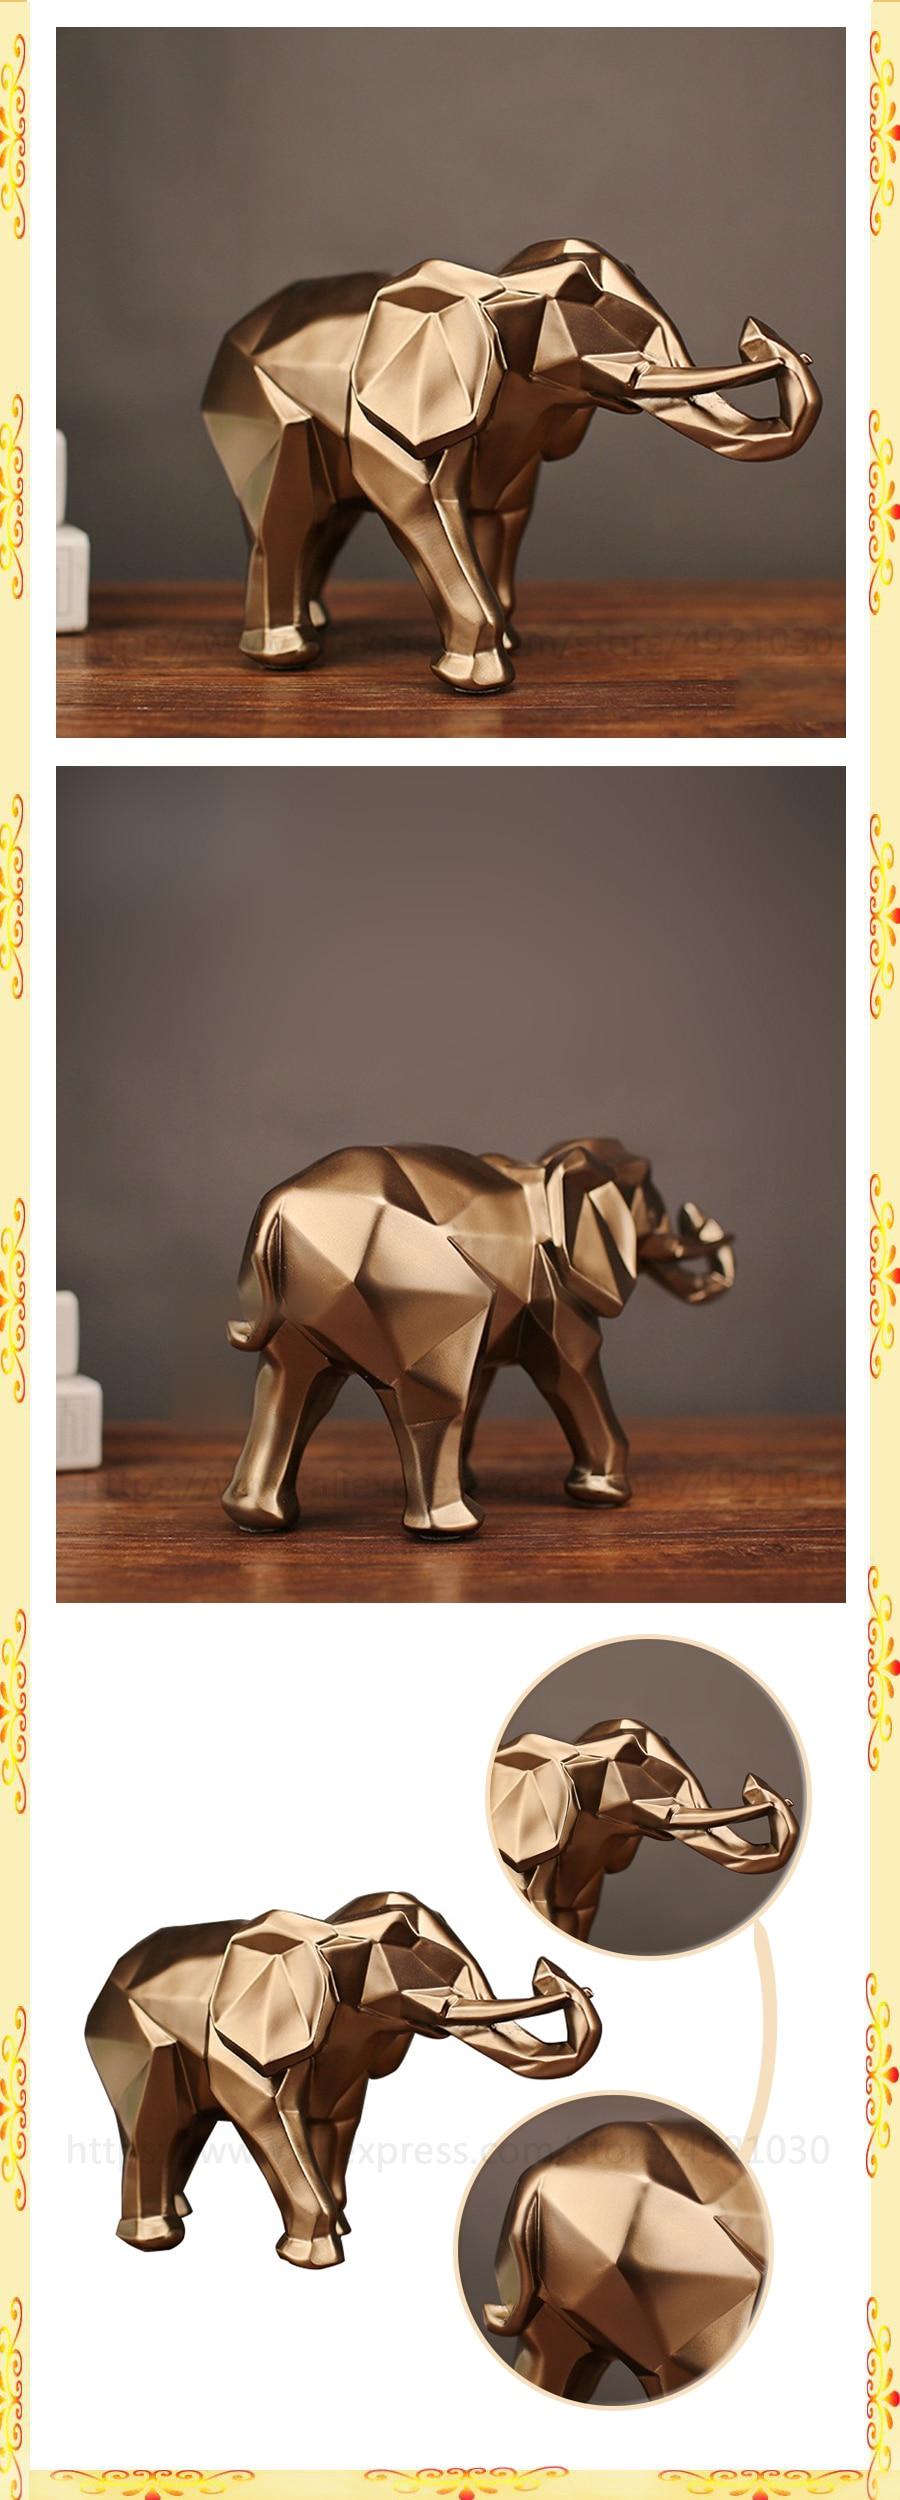 2021 abstrato moderno elefante dourado estátua resina